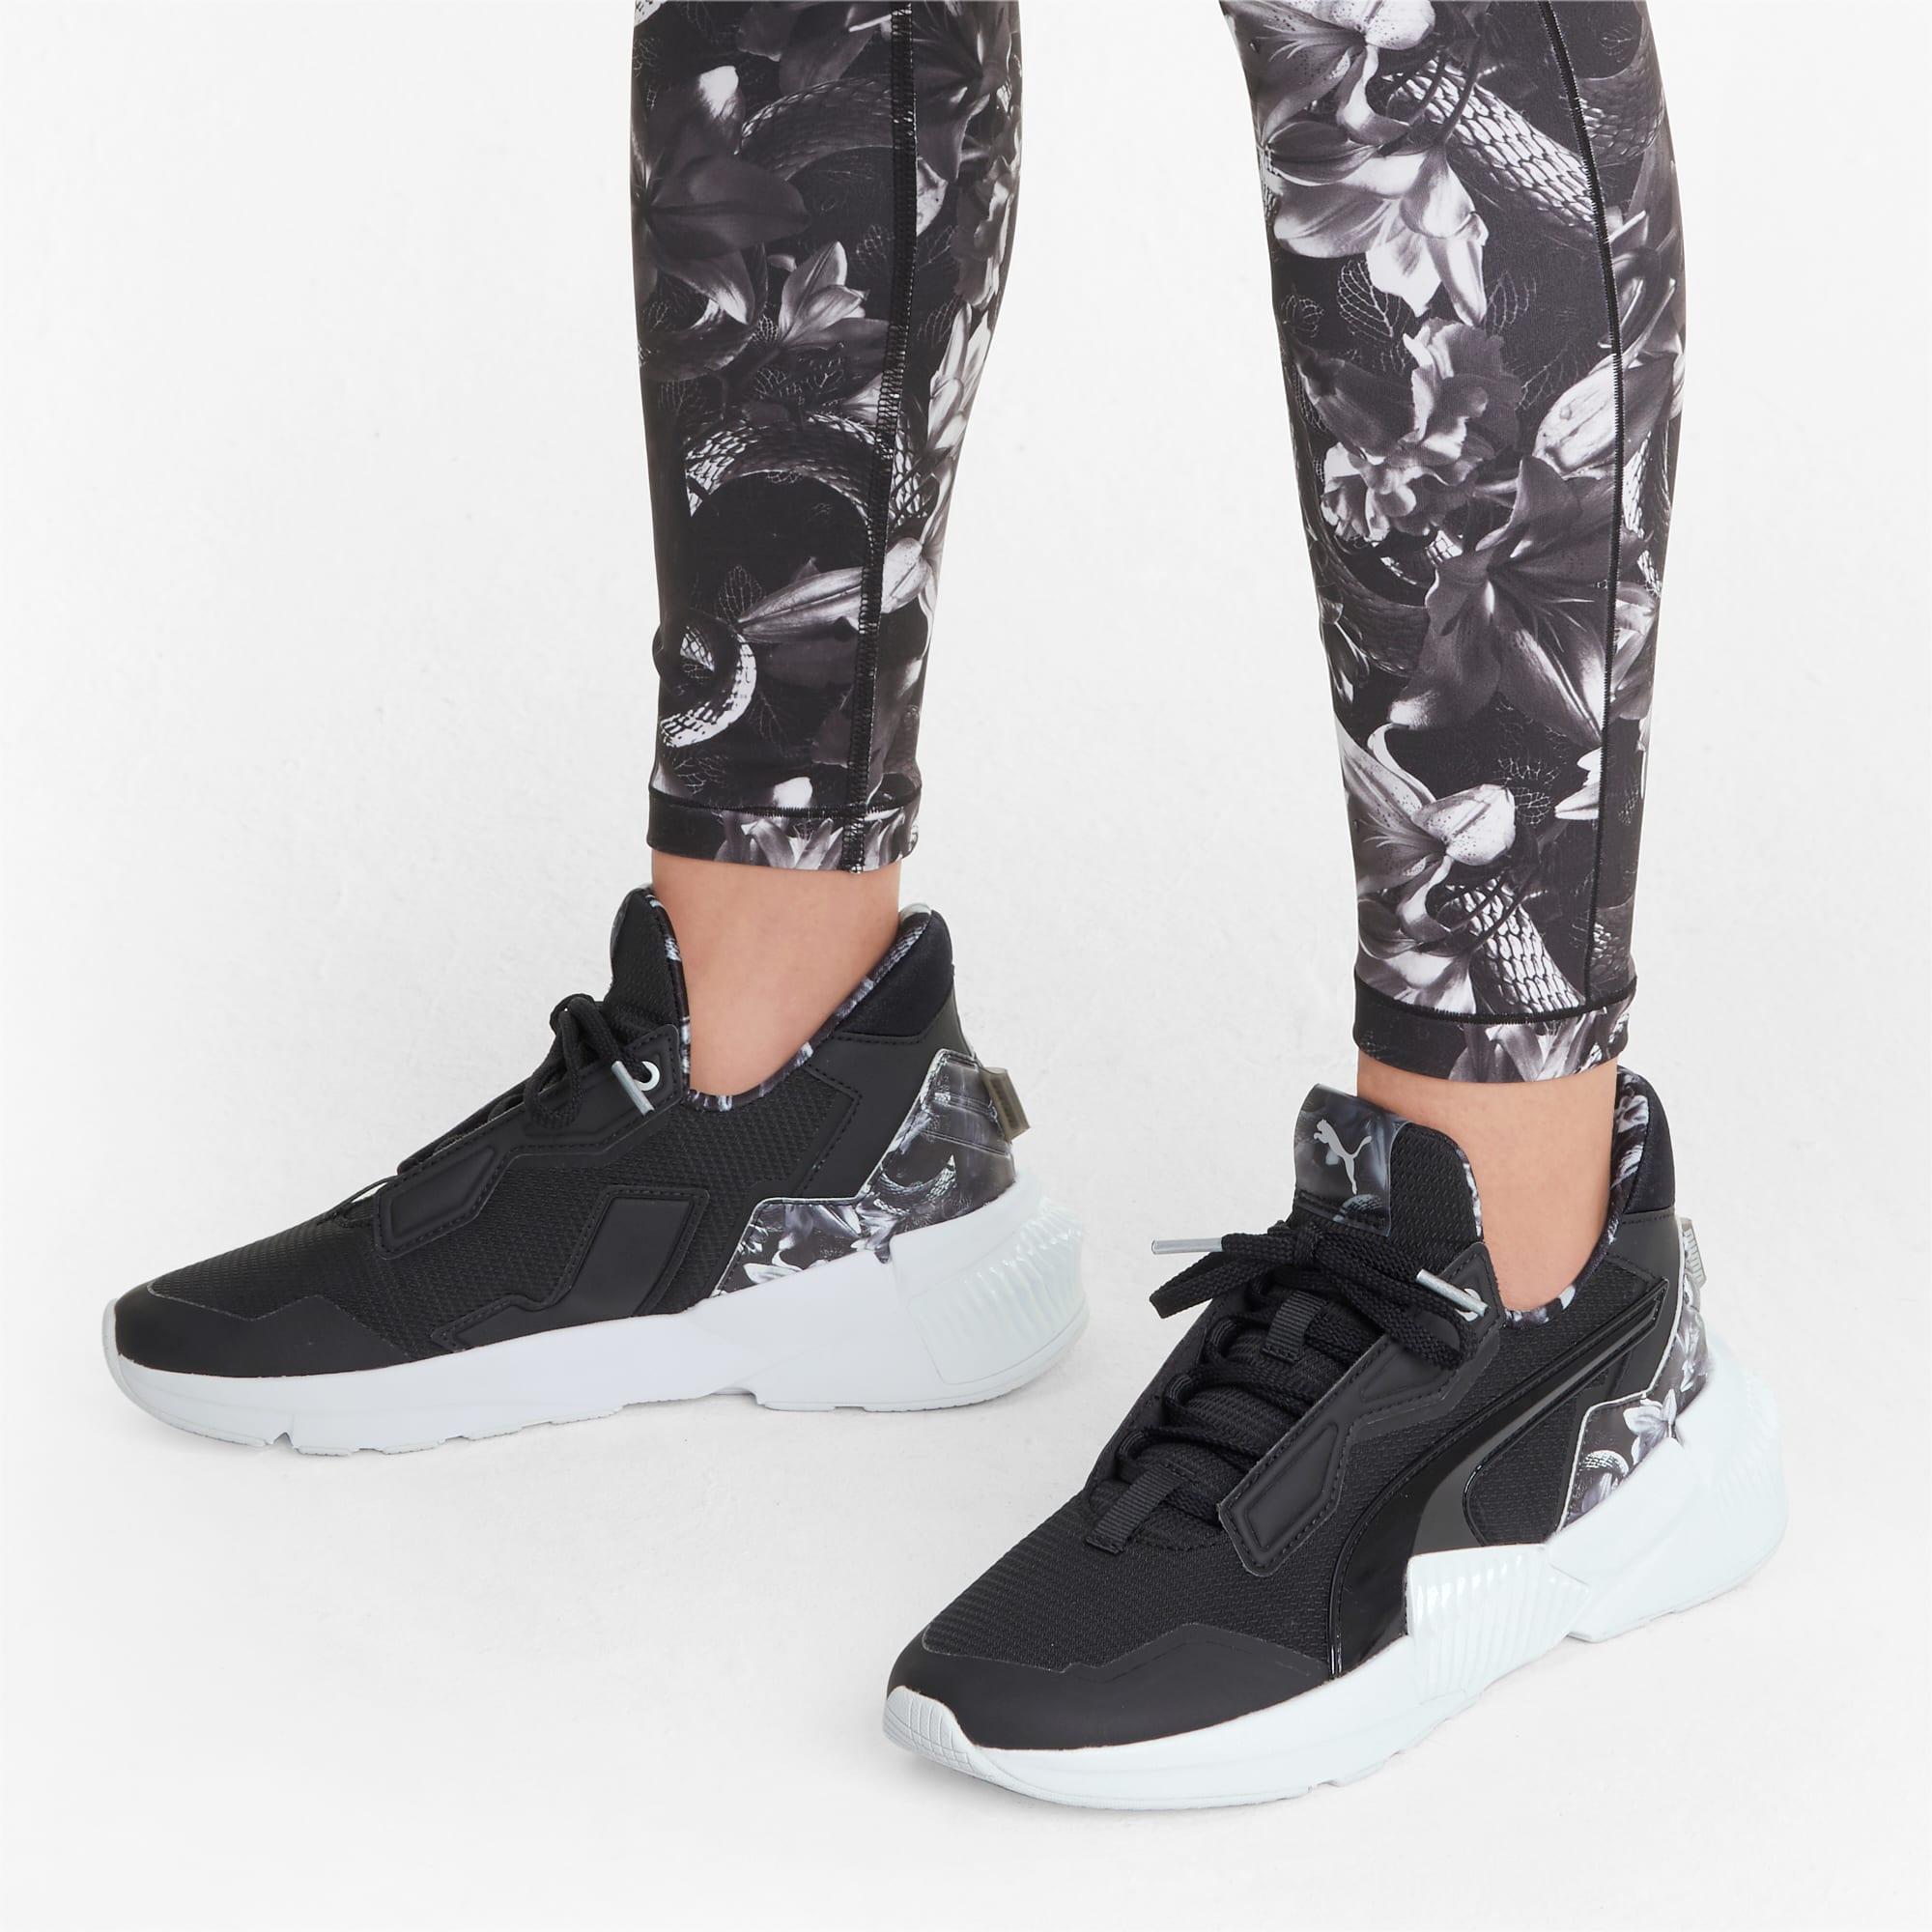 Provoke XT Untamed Floral Women's Training Shoes